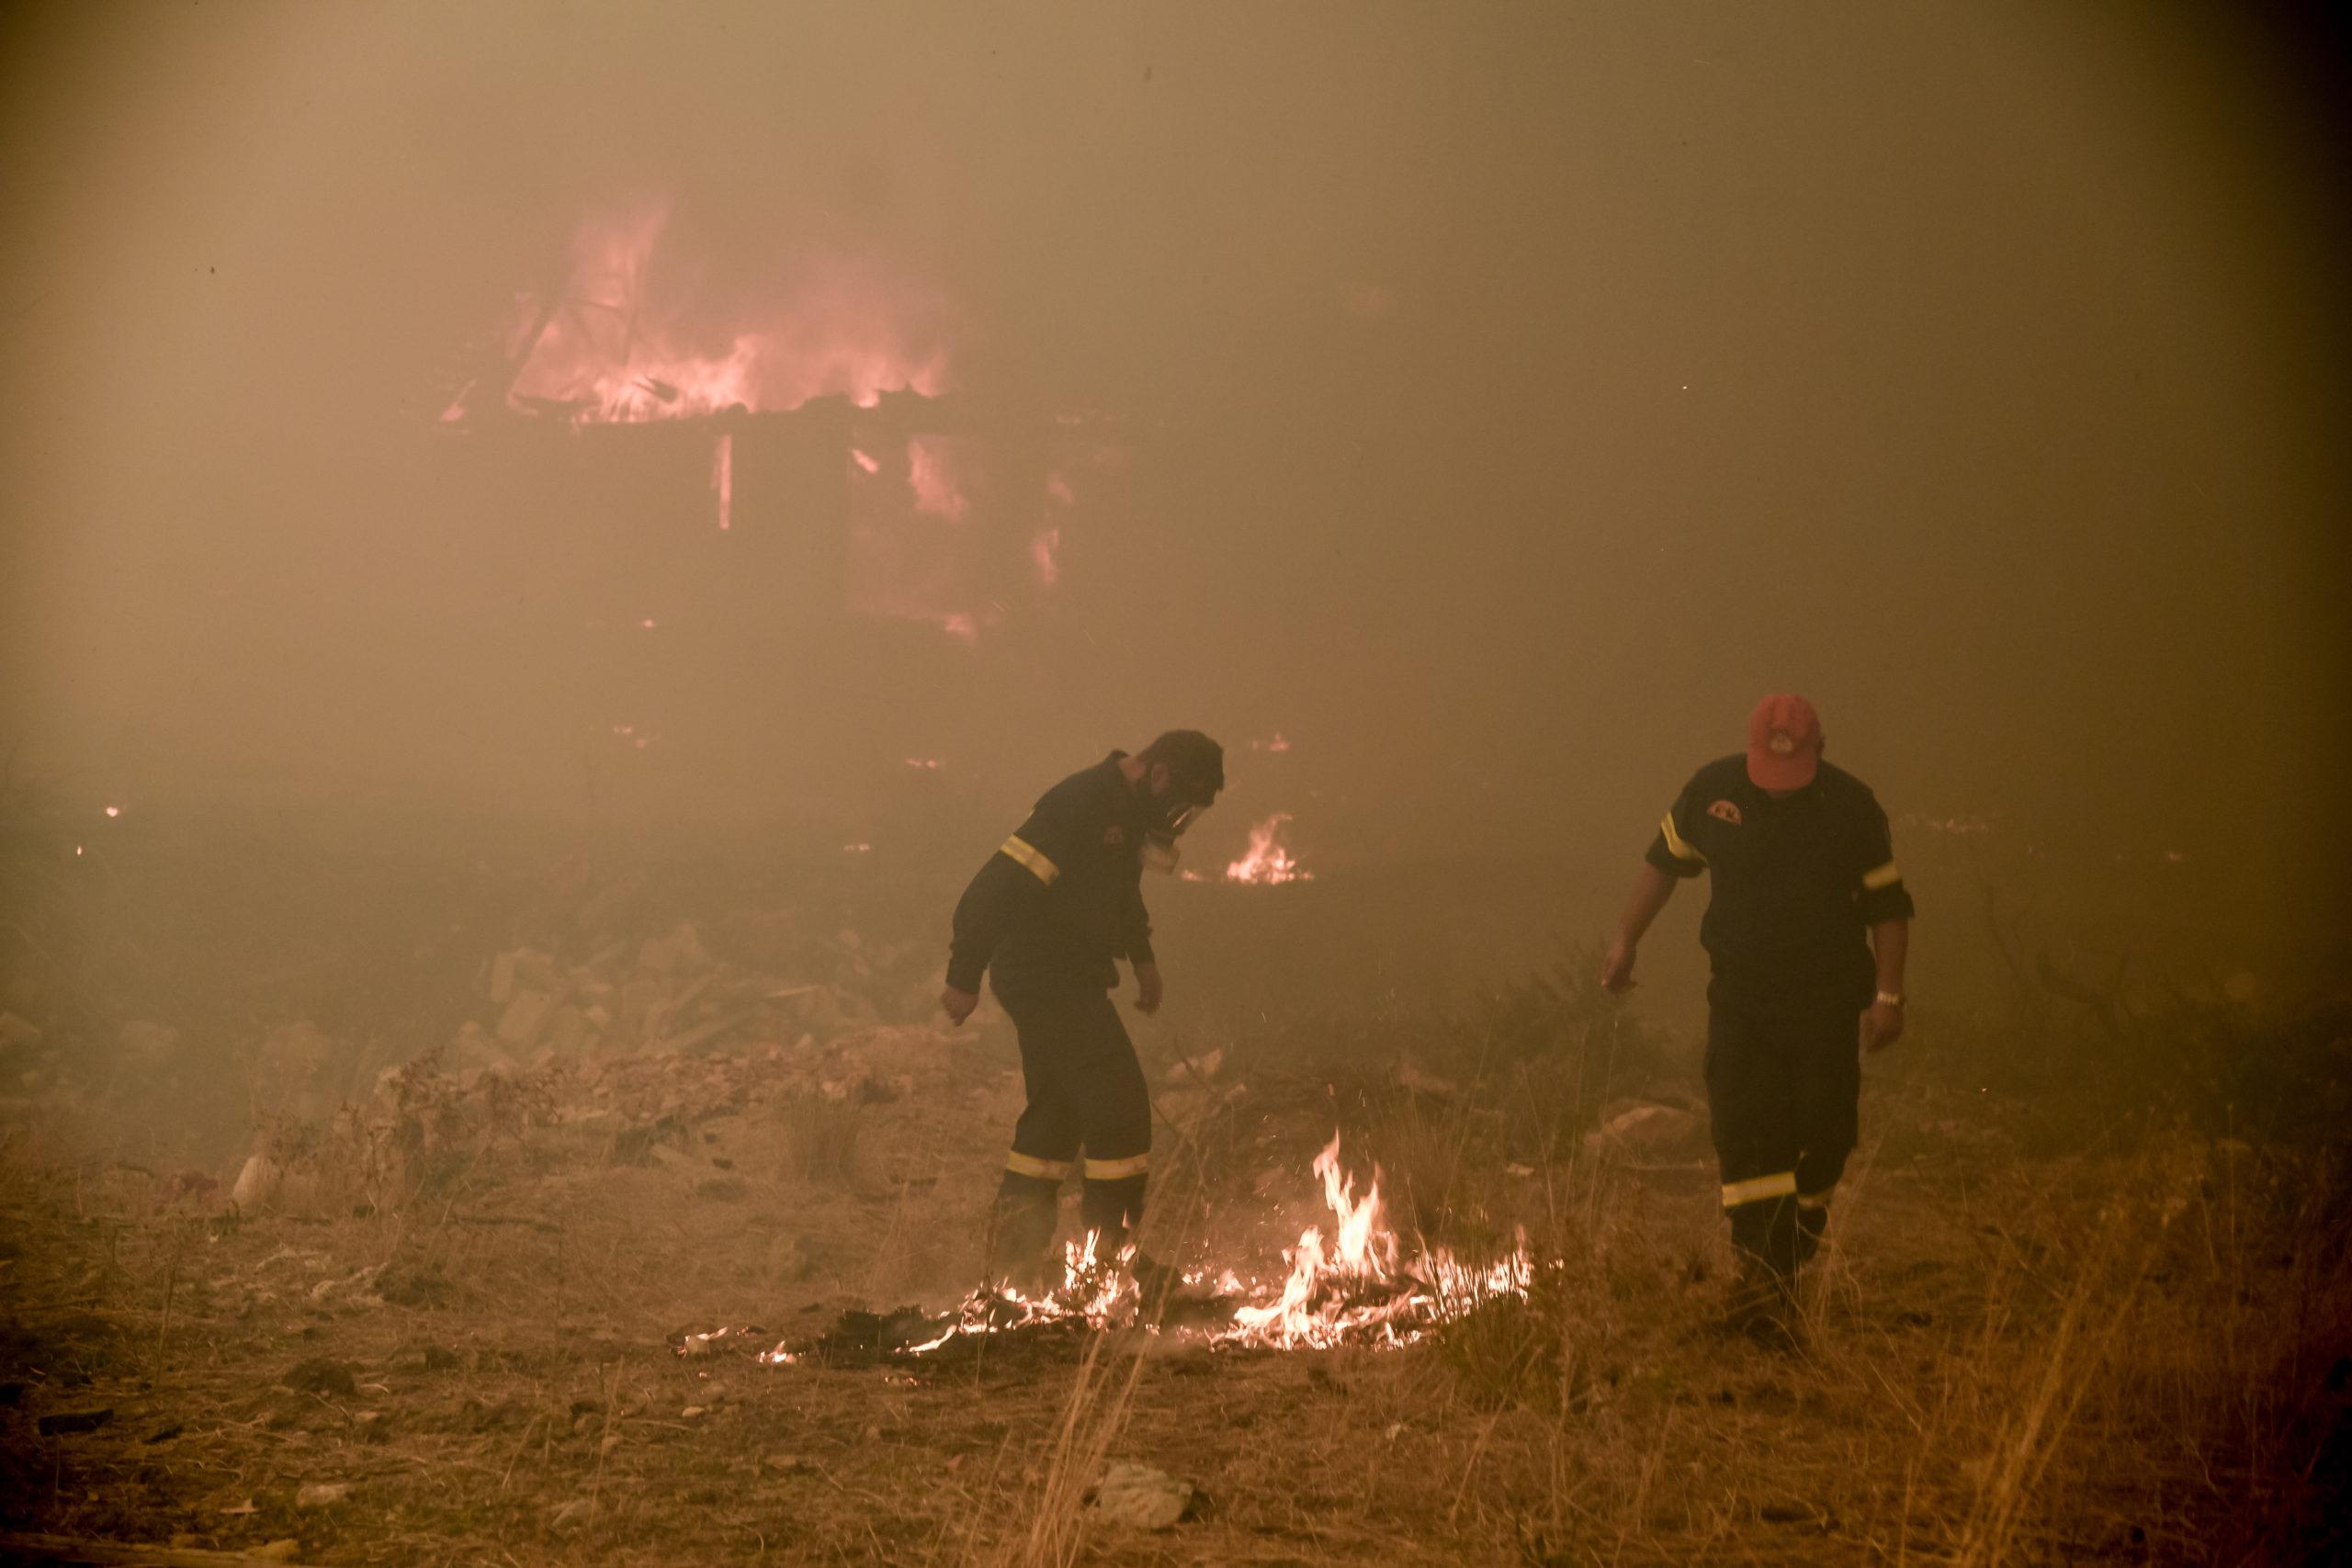 Live - Πύρινος κλοιός στα Βίλια: Δύσκολη μάχη με τις φλόγες, αγώνας να  σωθούν σπίτια ― Ώρες αγωνίας (video και φωτογραφίες) - ertnews.gr